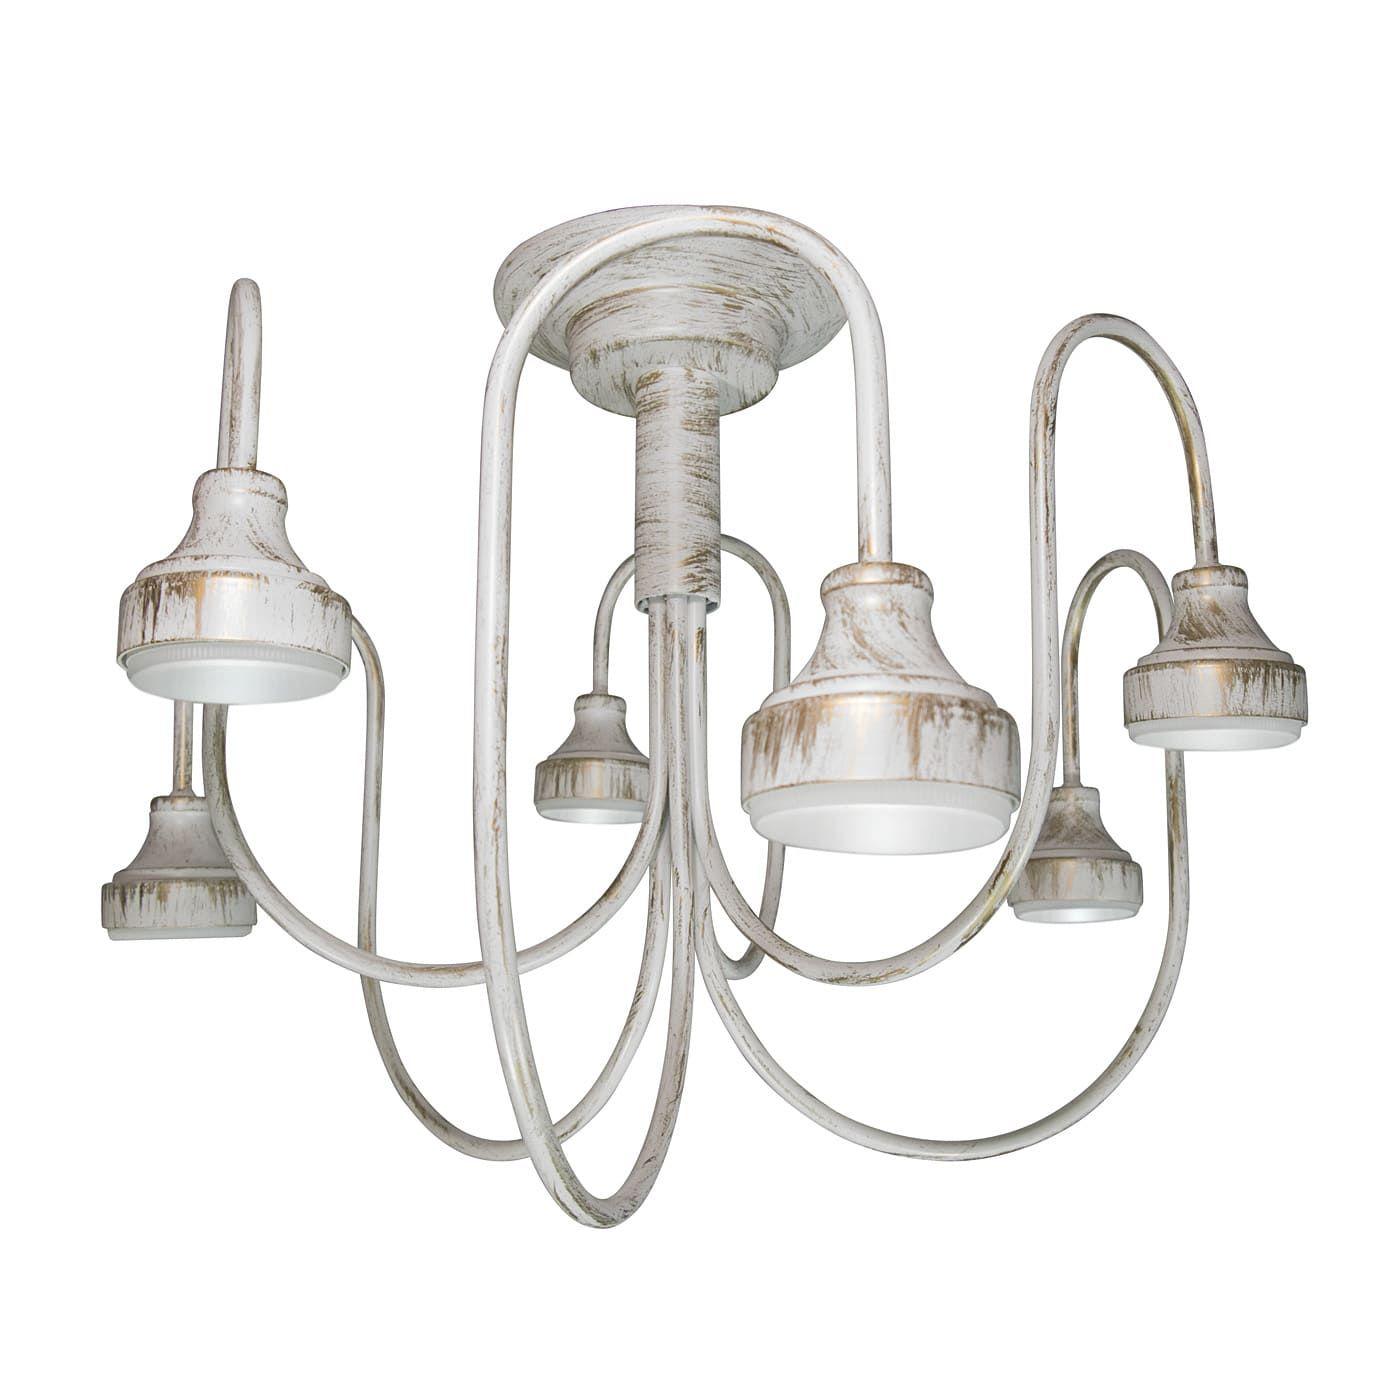 PETRASVET / Ceiling chandelier S2399-6, 6xGX53